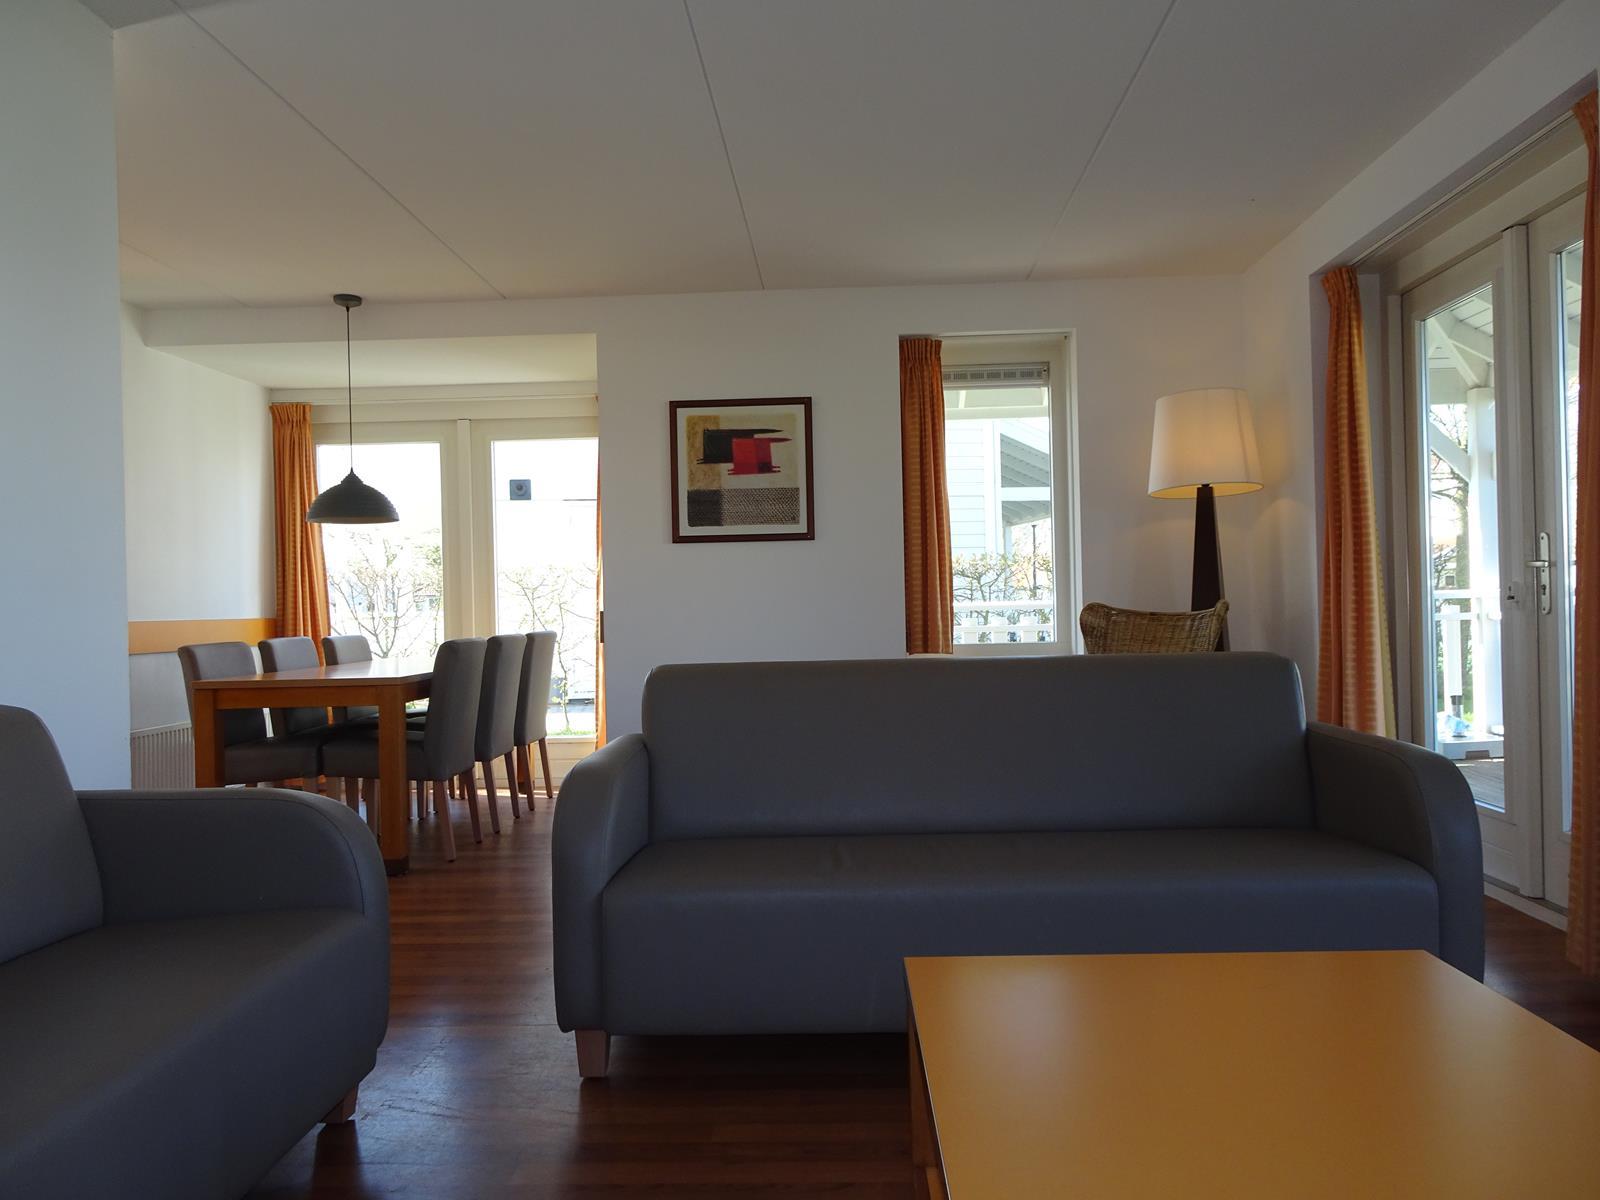 Vakantiehuis te koop Zeeland Bruinisse K41 (5).jpg